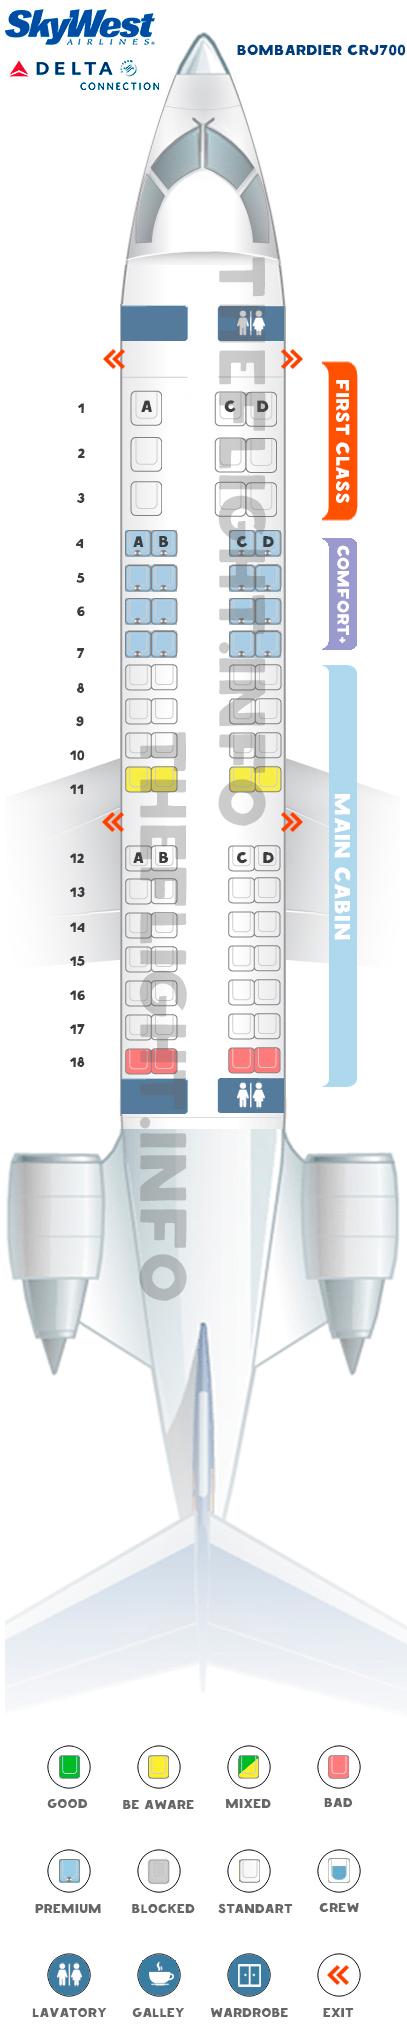 Seat map Bombardier CRJ700 Delta Connection Skywest